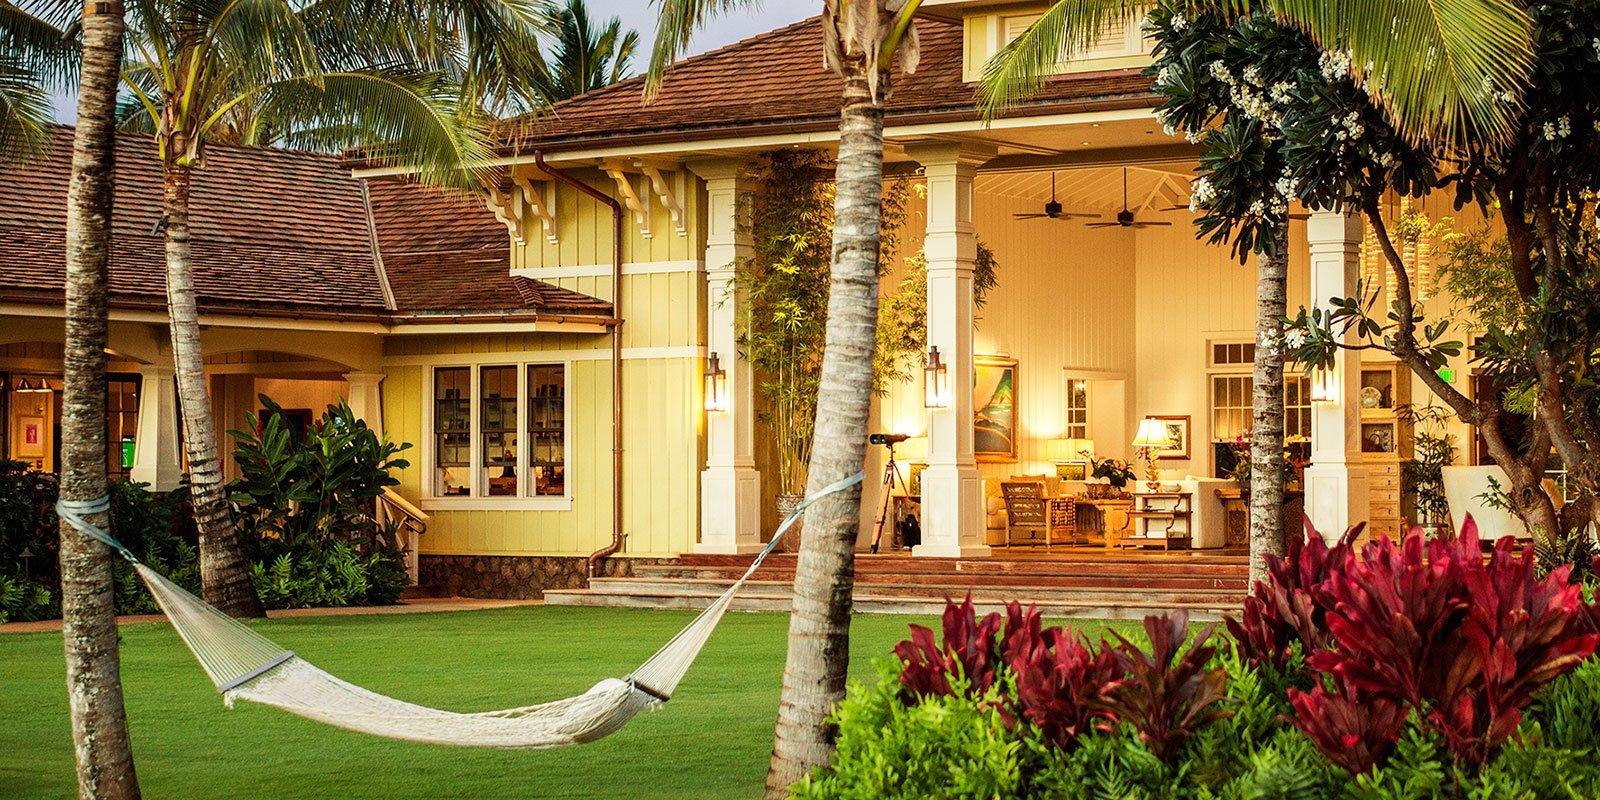 The Plantation House Club House